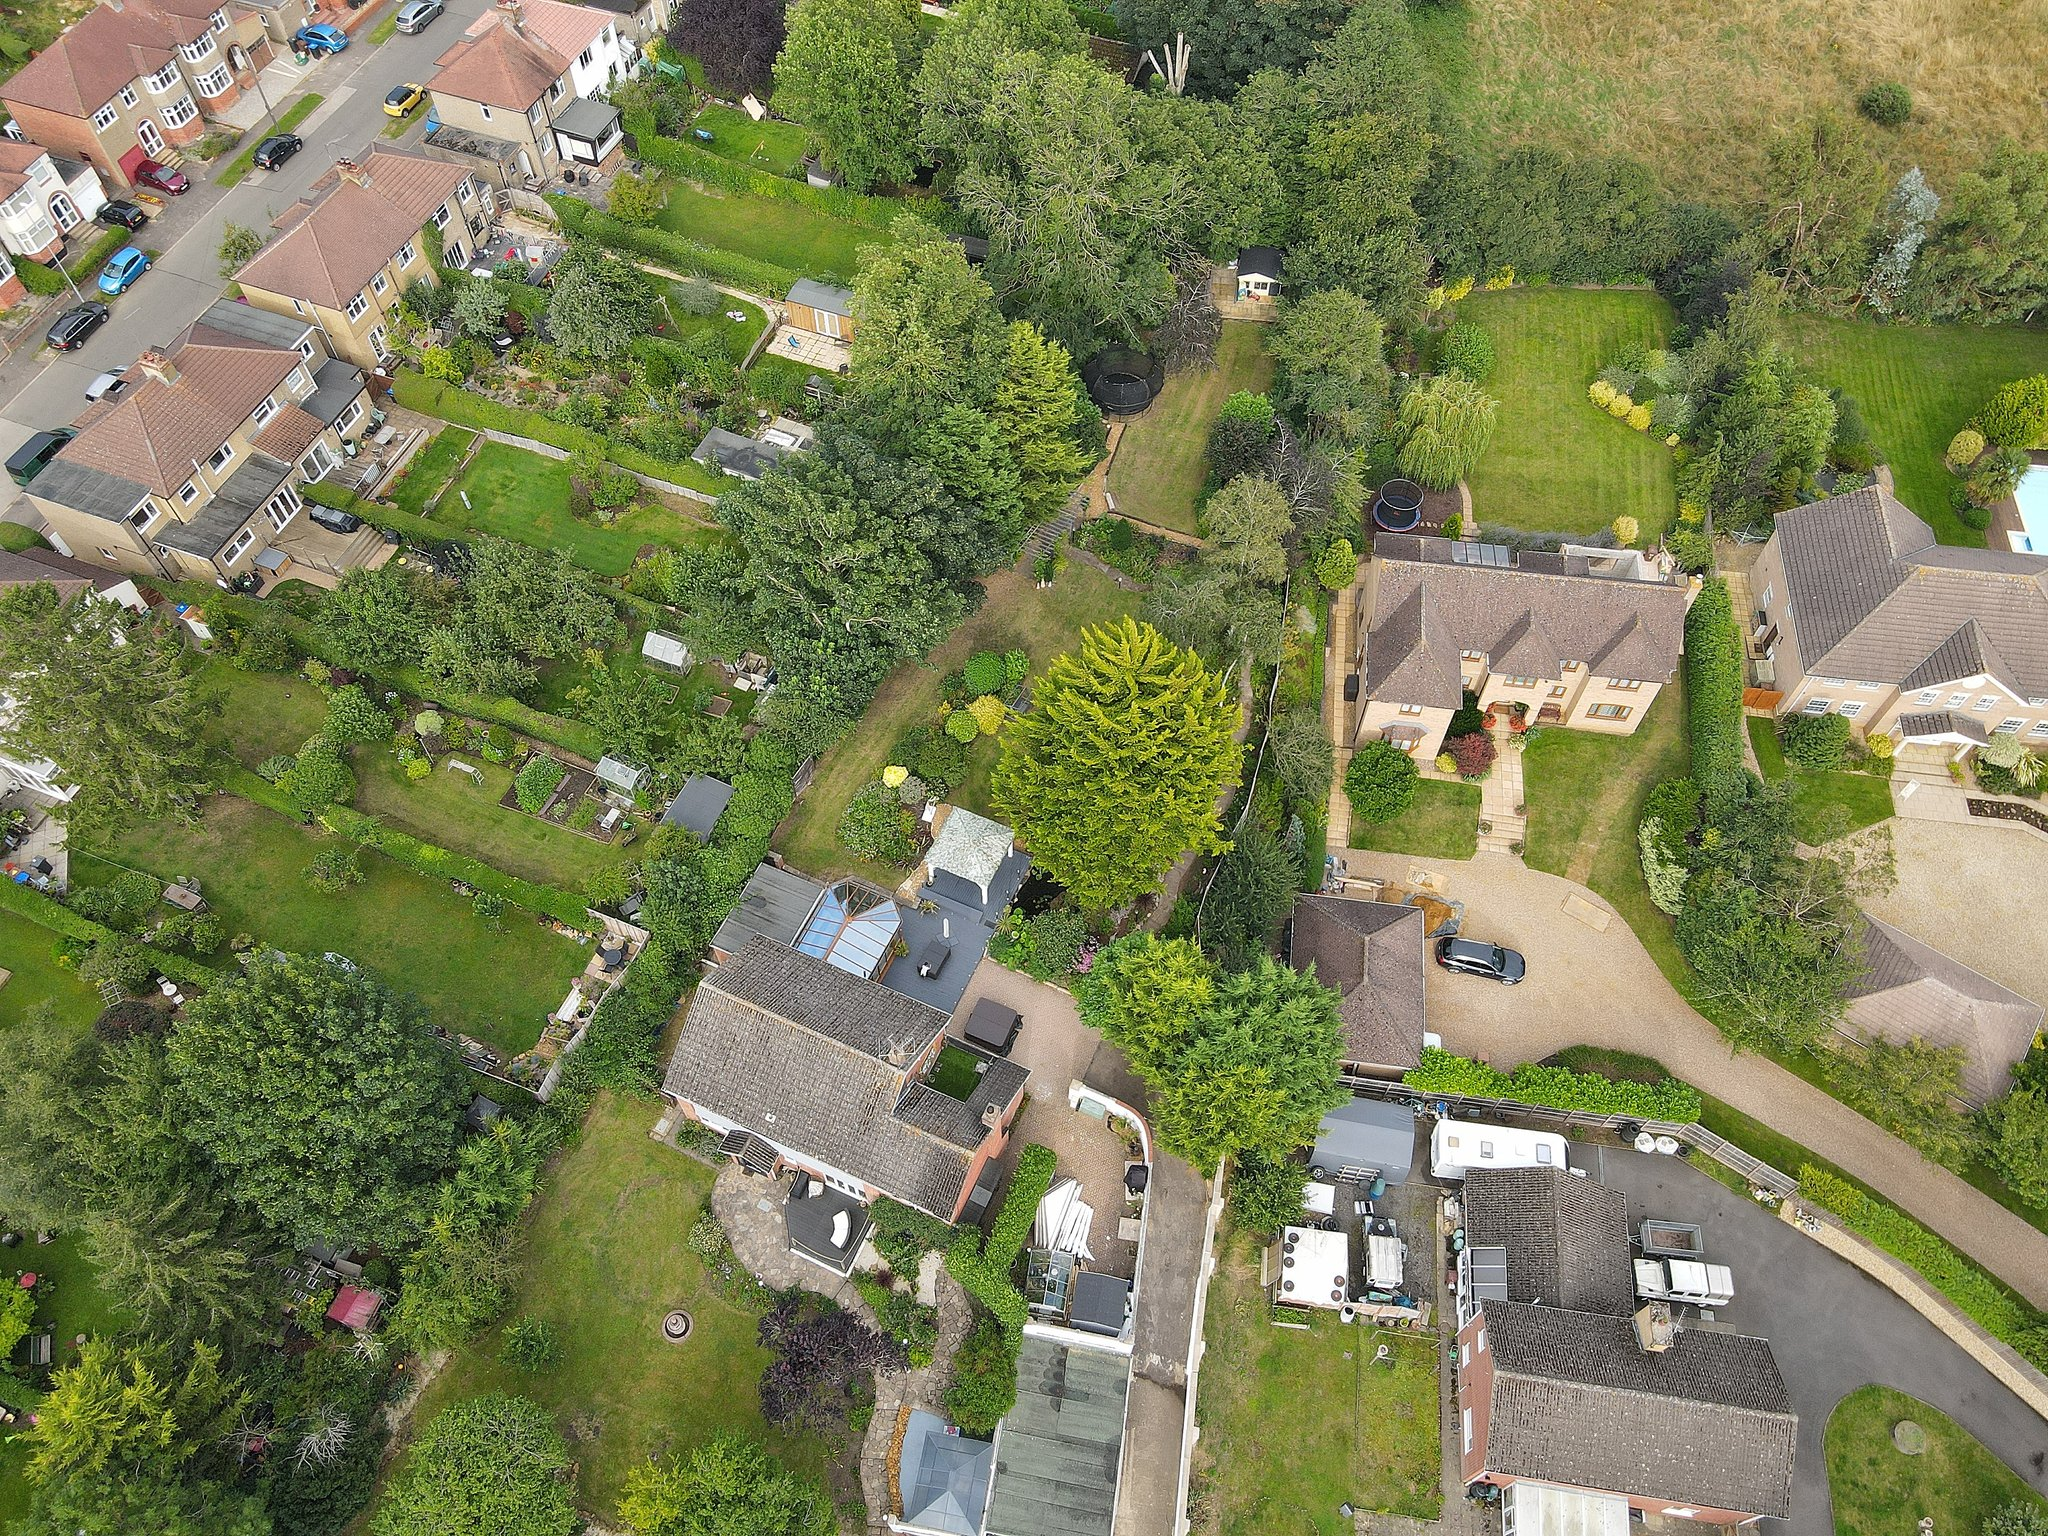 Harborough Road North, Northampton